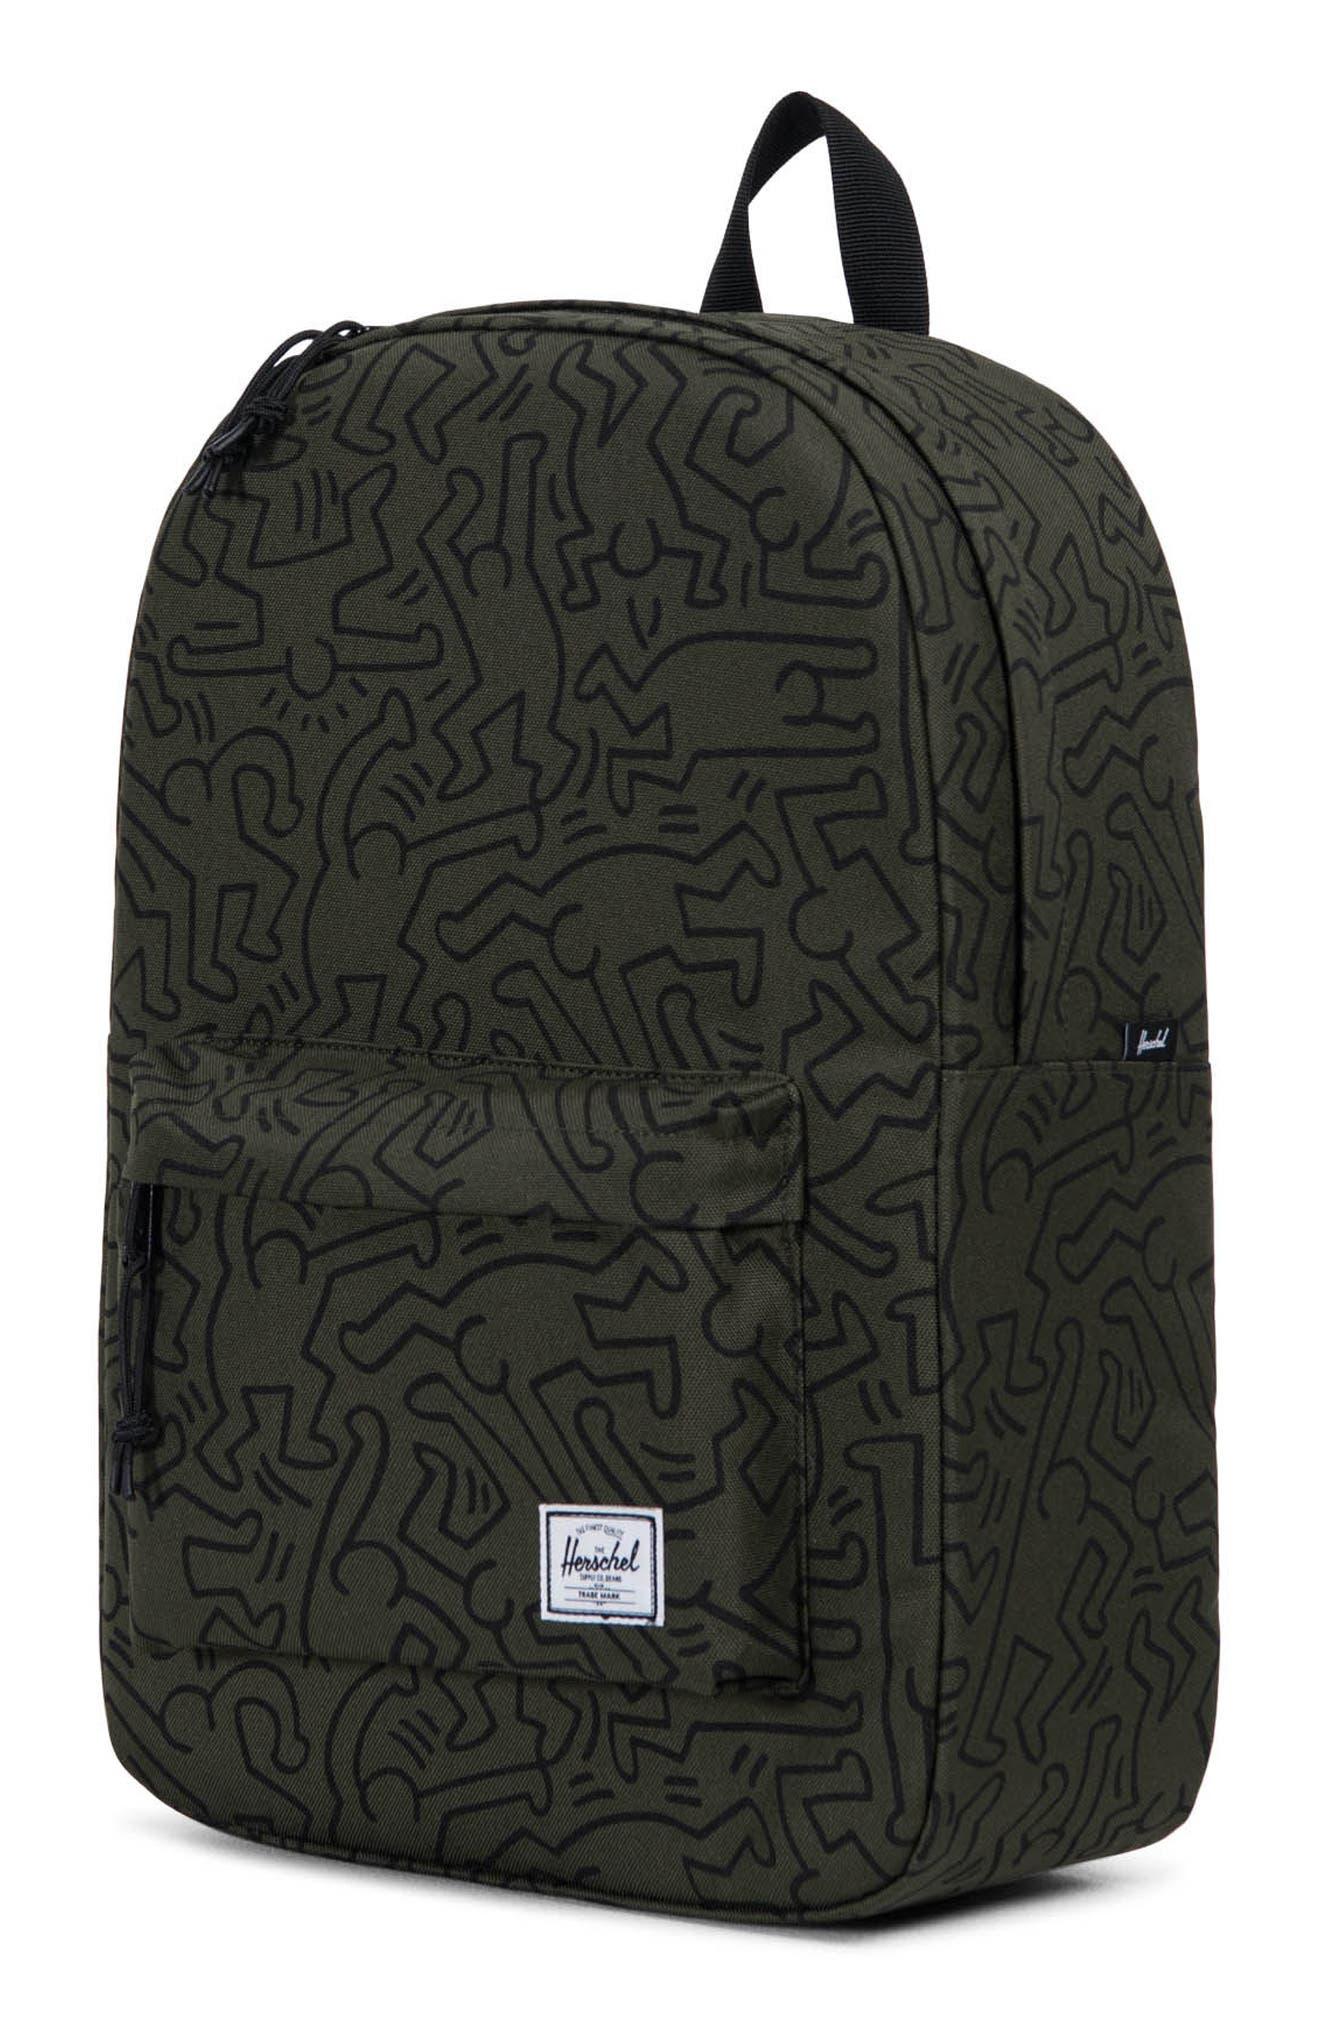 Herschel Supply Co. Winlaw x Keith Haring Backpack